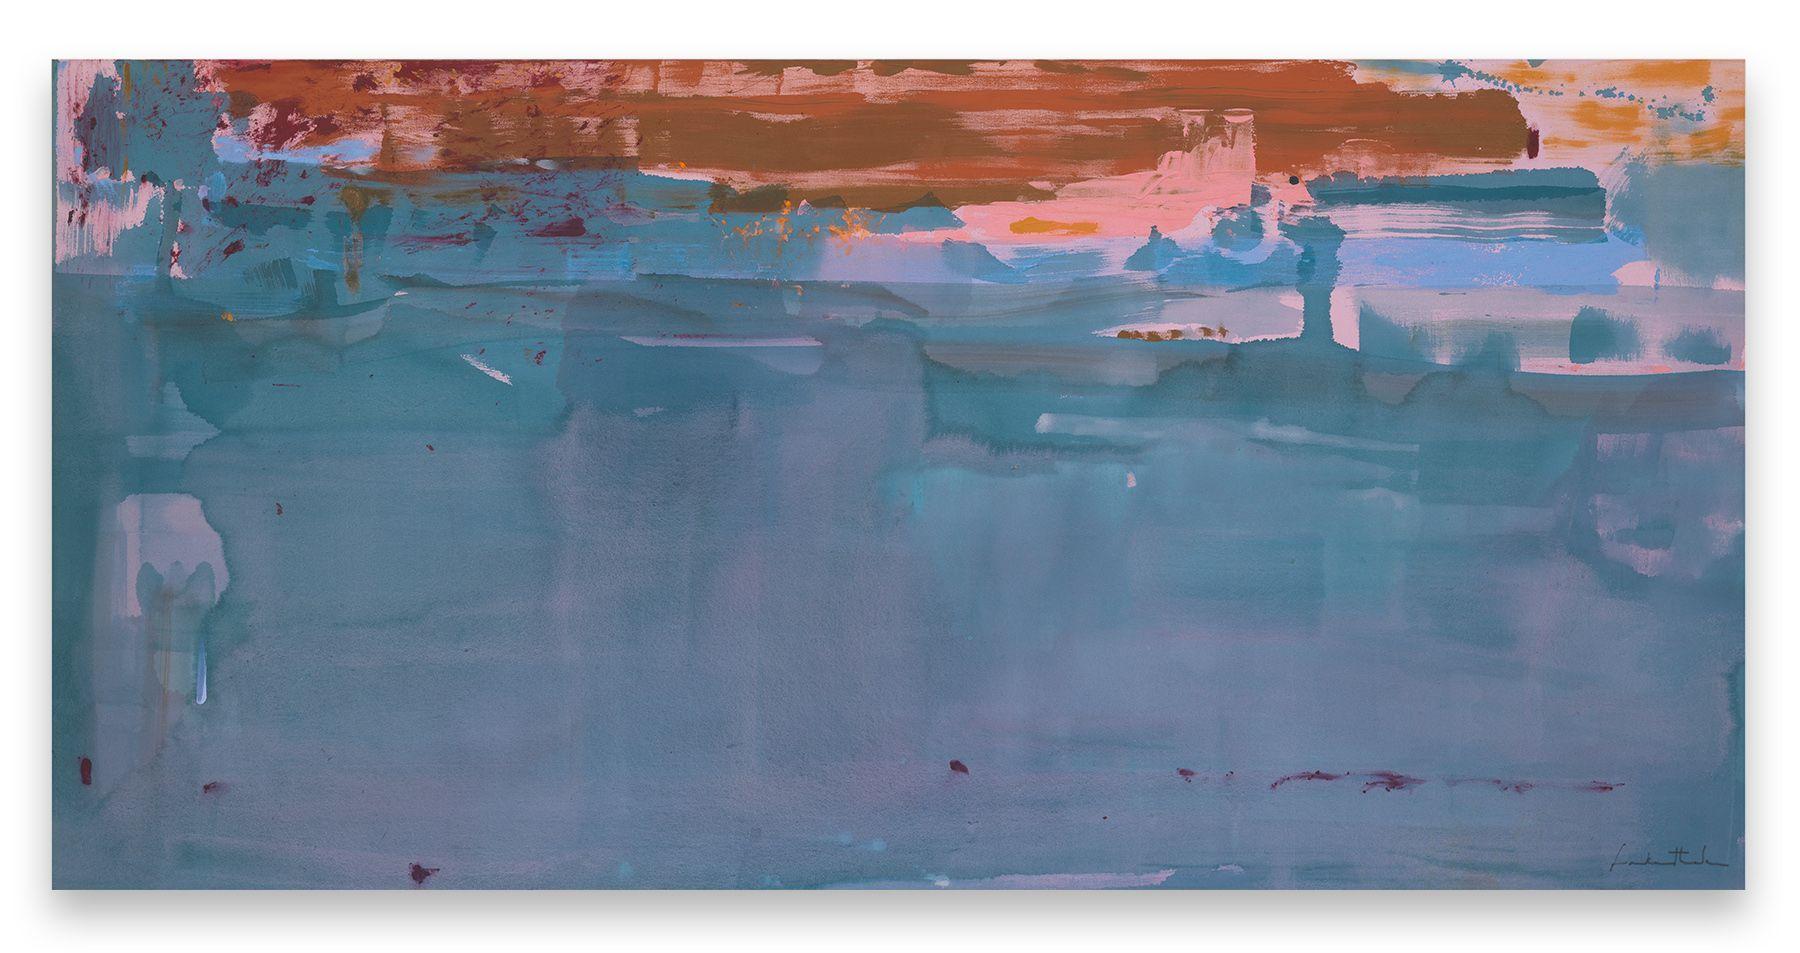 Basin, 1979, Acrylic on canvas, 52 x 106 inches, 132.1 x 269.2 cm, MMG#28016